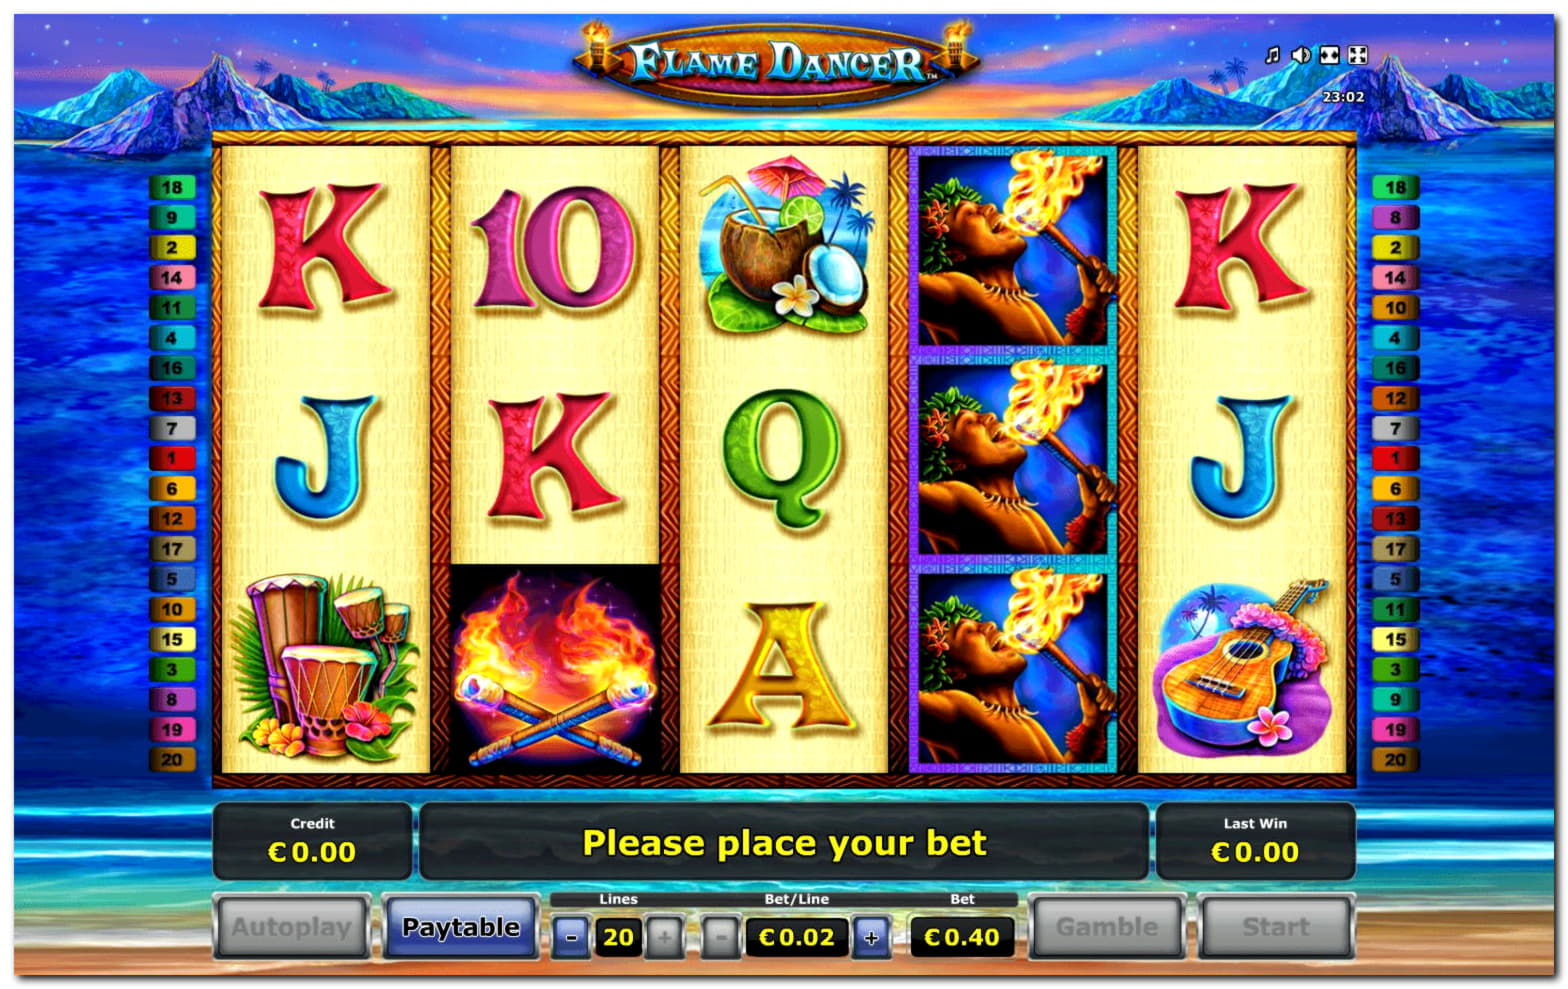 235 free spins no deposit at Betway Casino